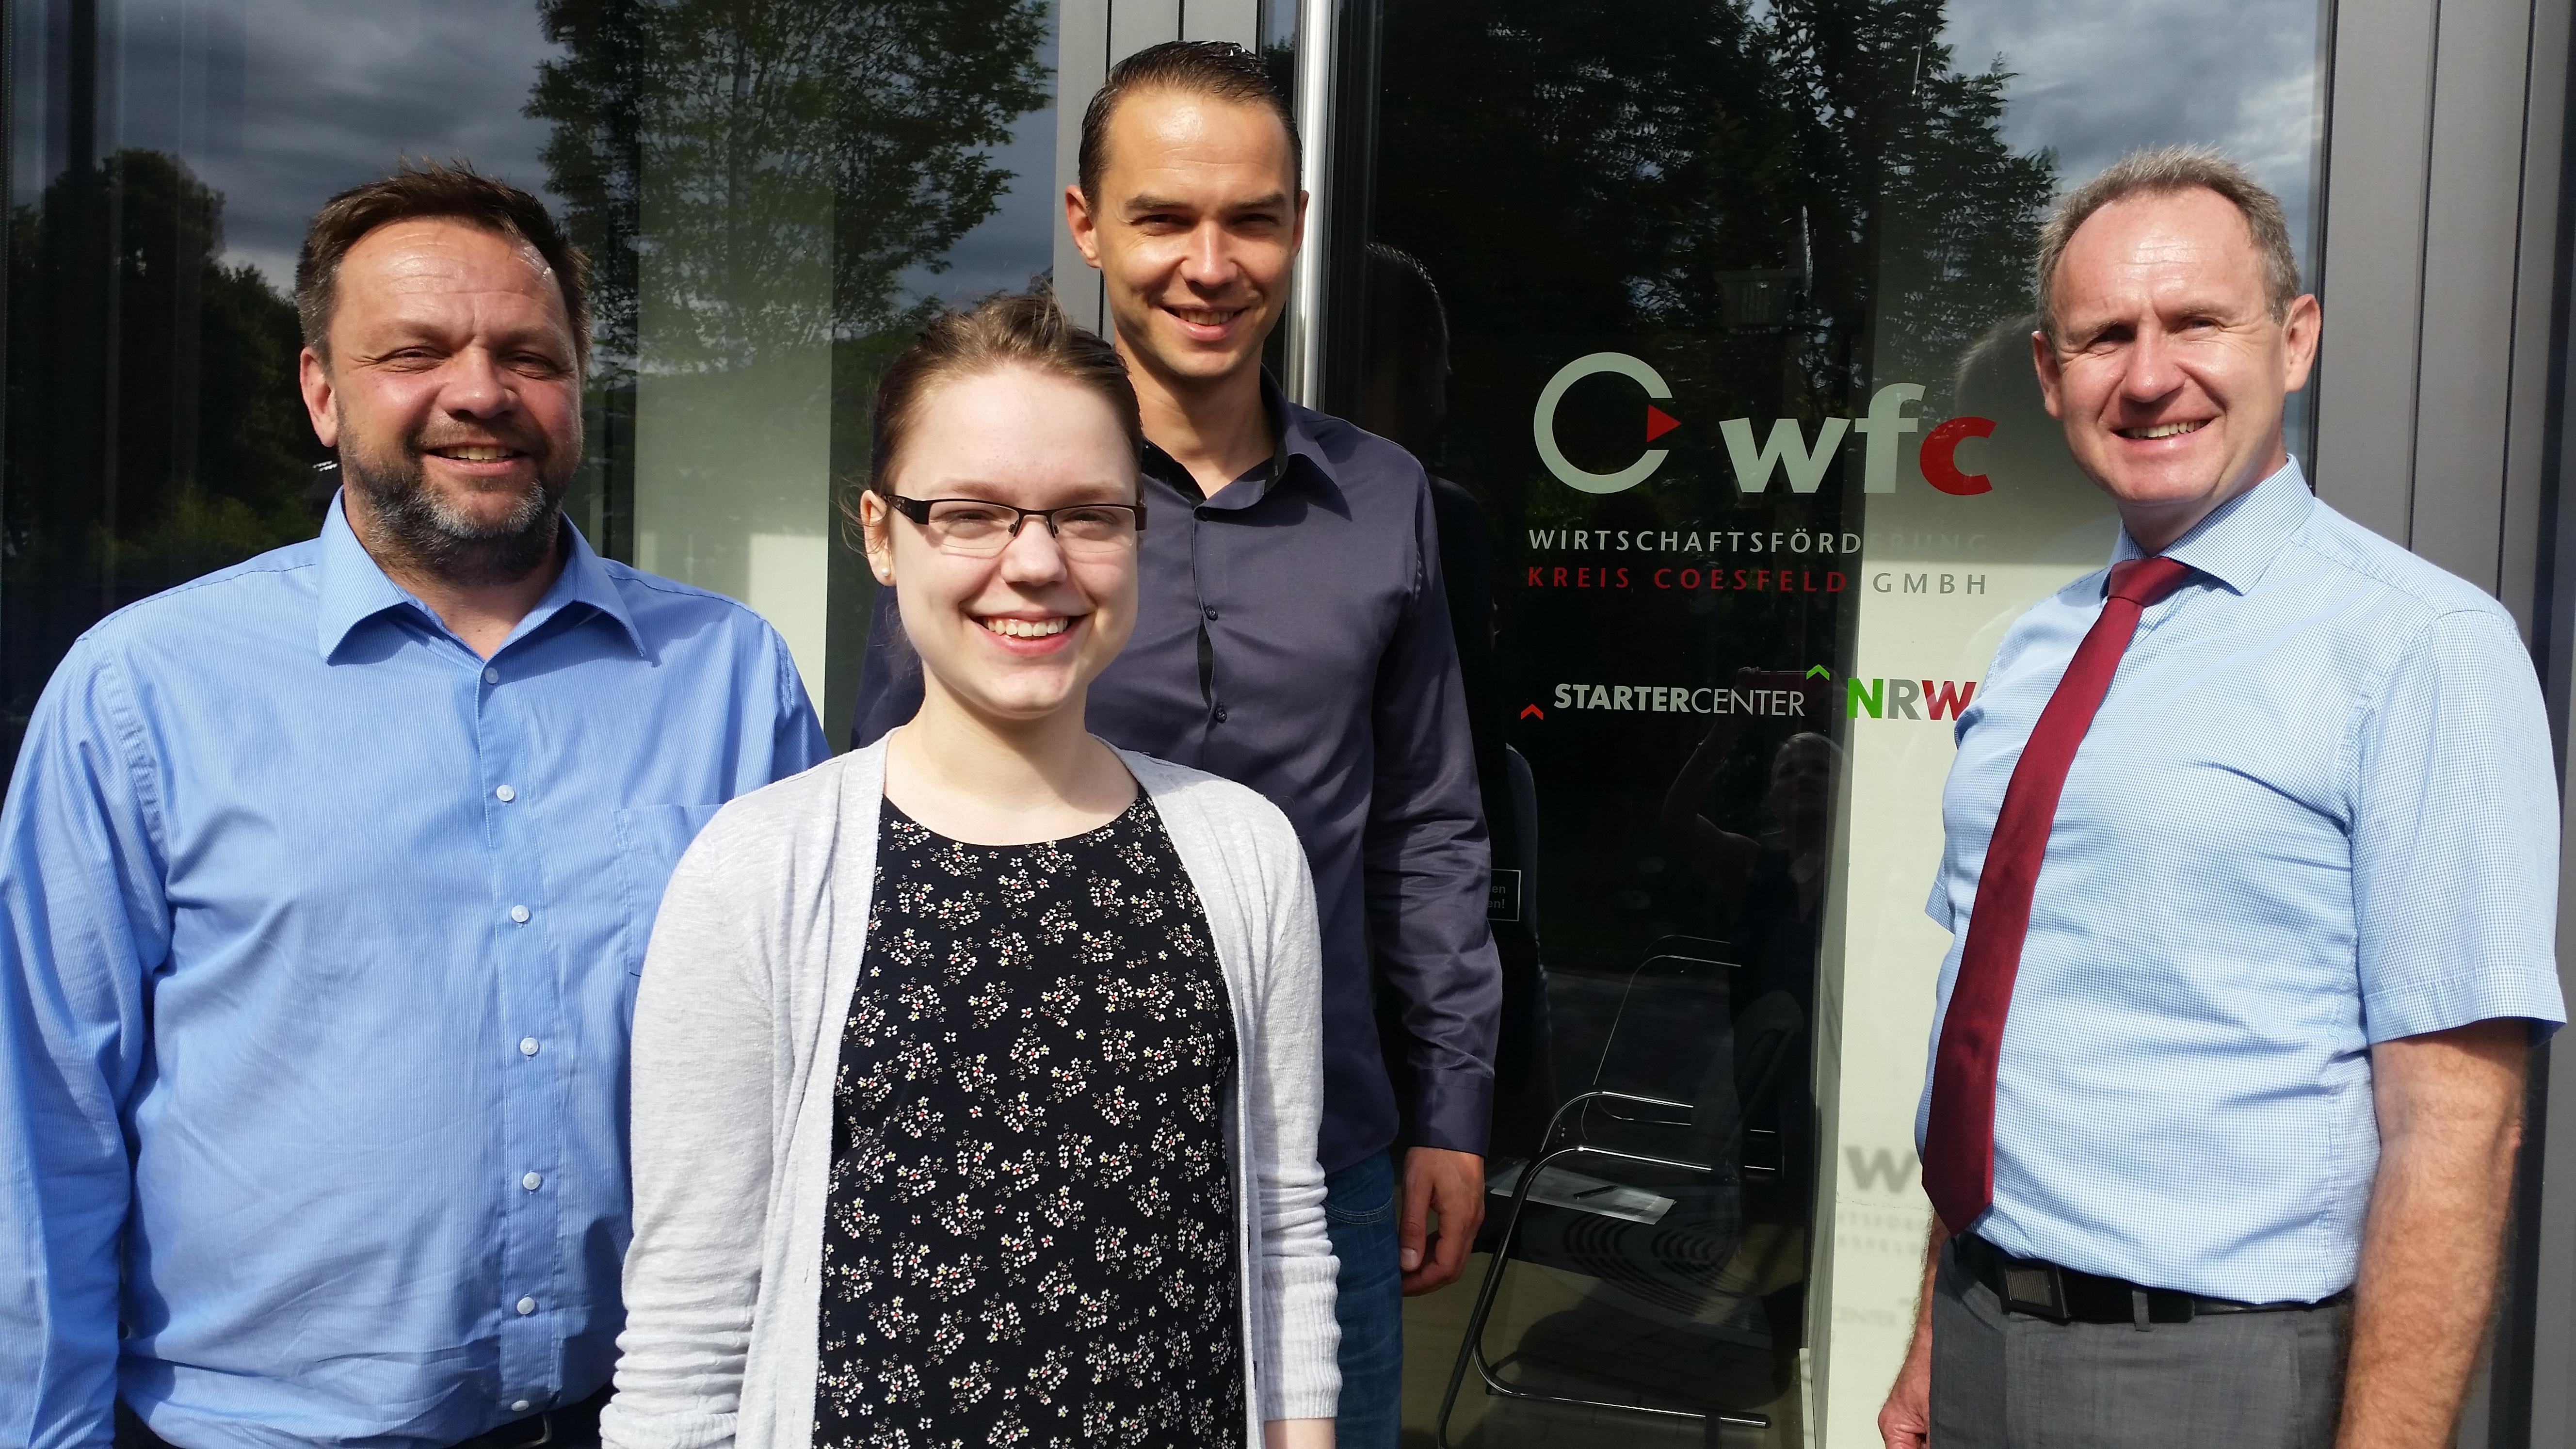 Kreis Coesfeld: wfc legt Gründungsevaluation 2016 vor